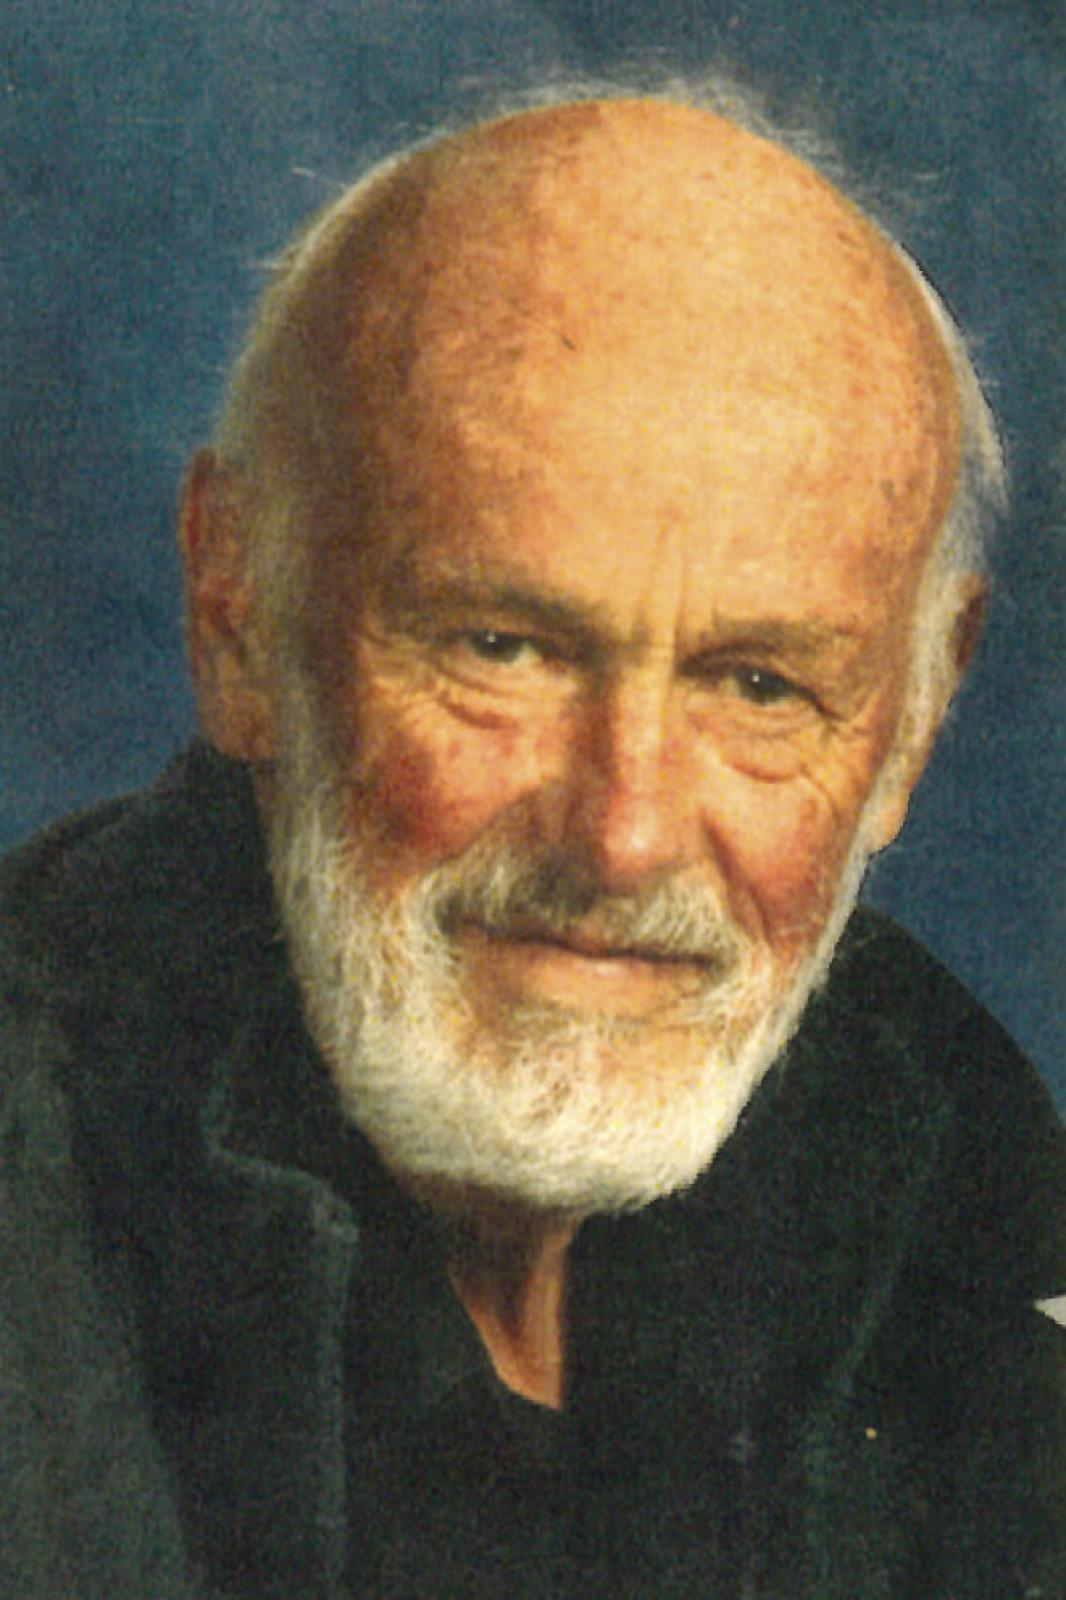 Wally Zomer